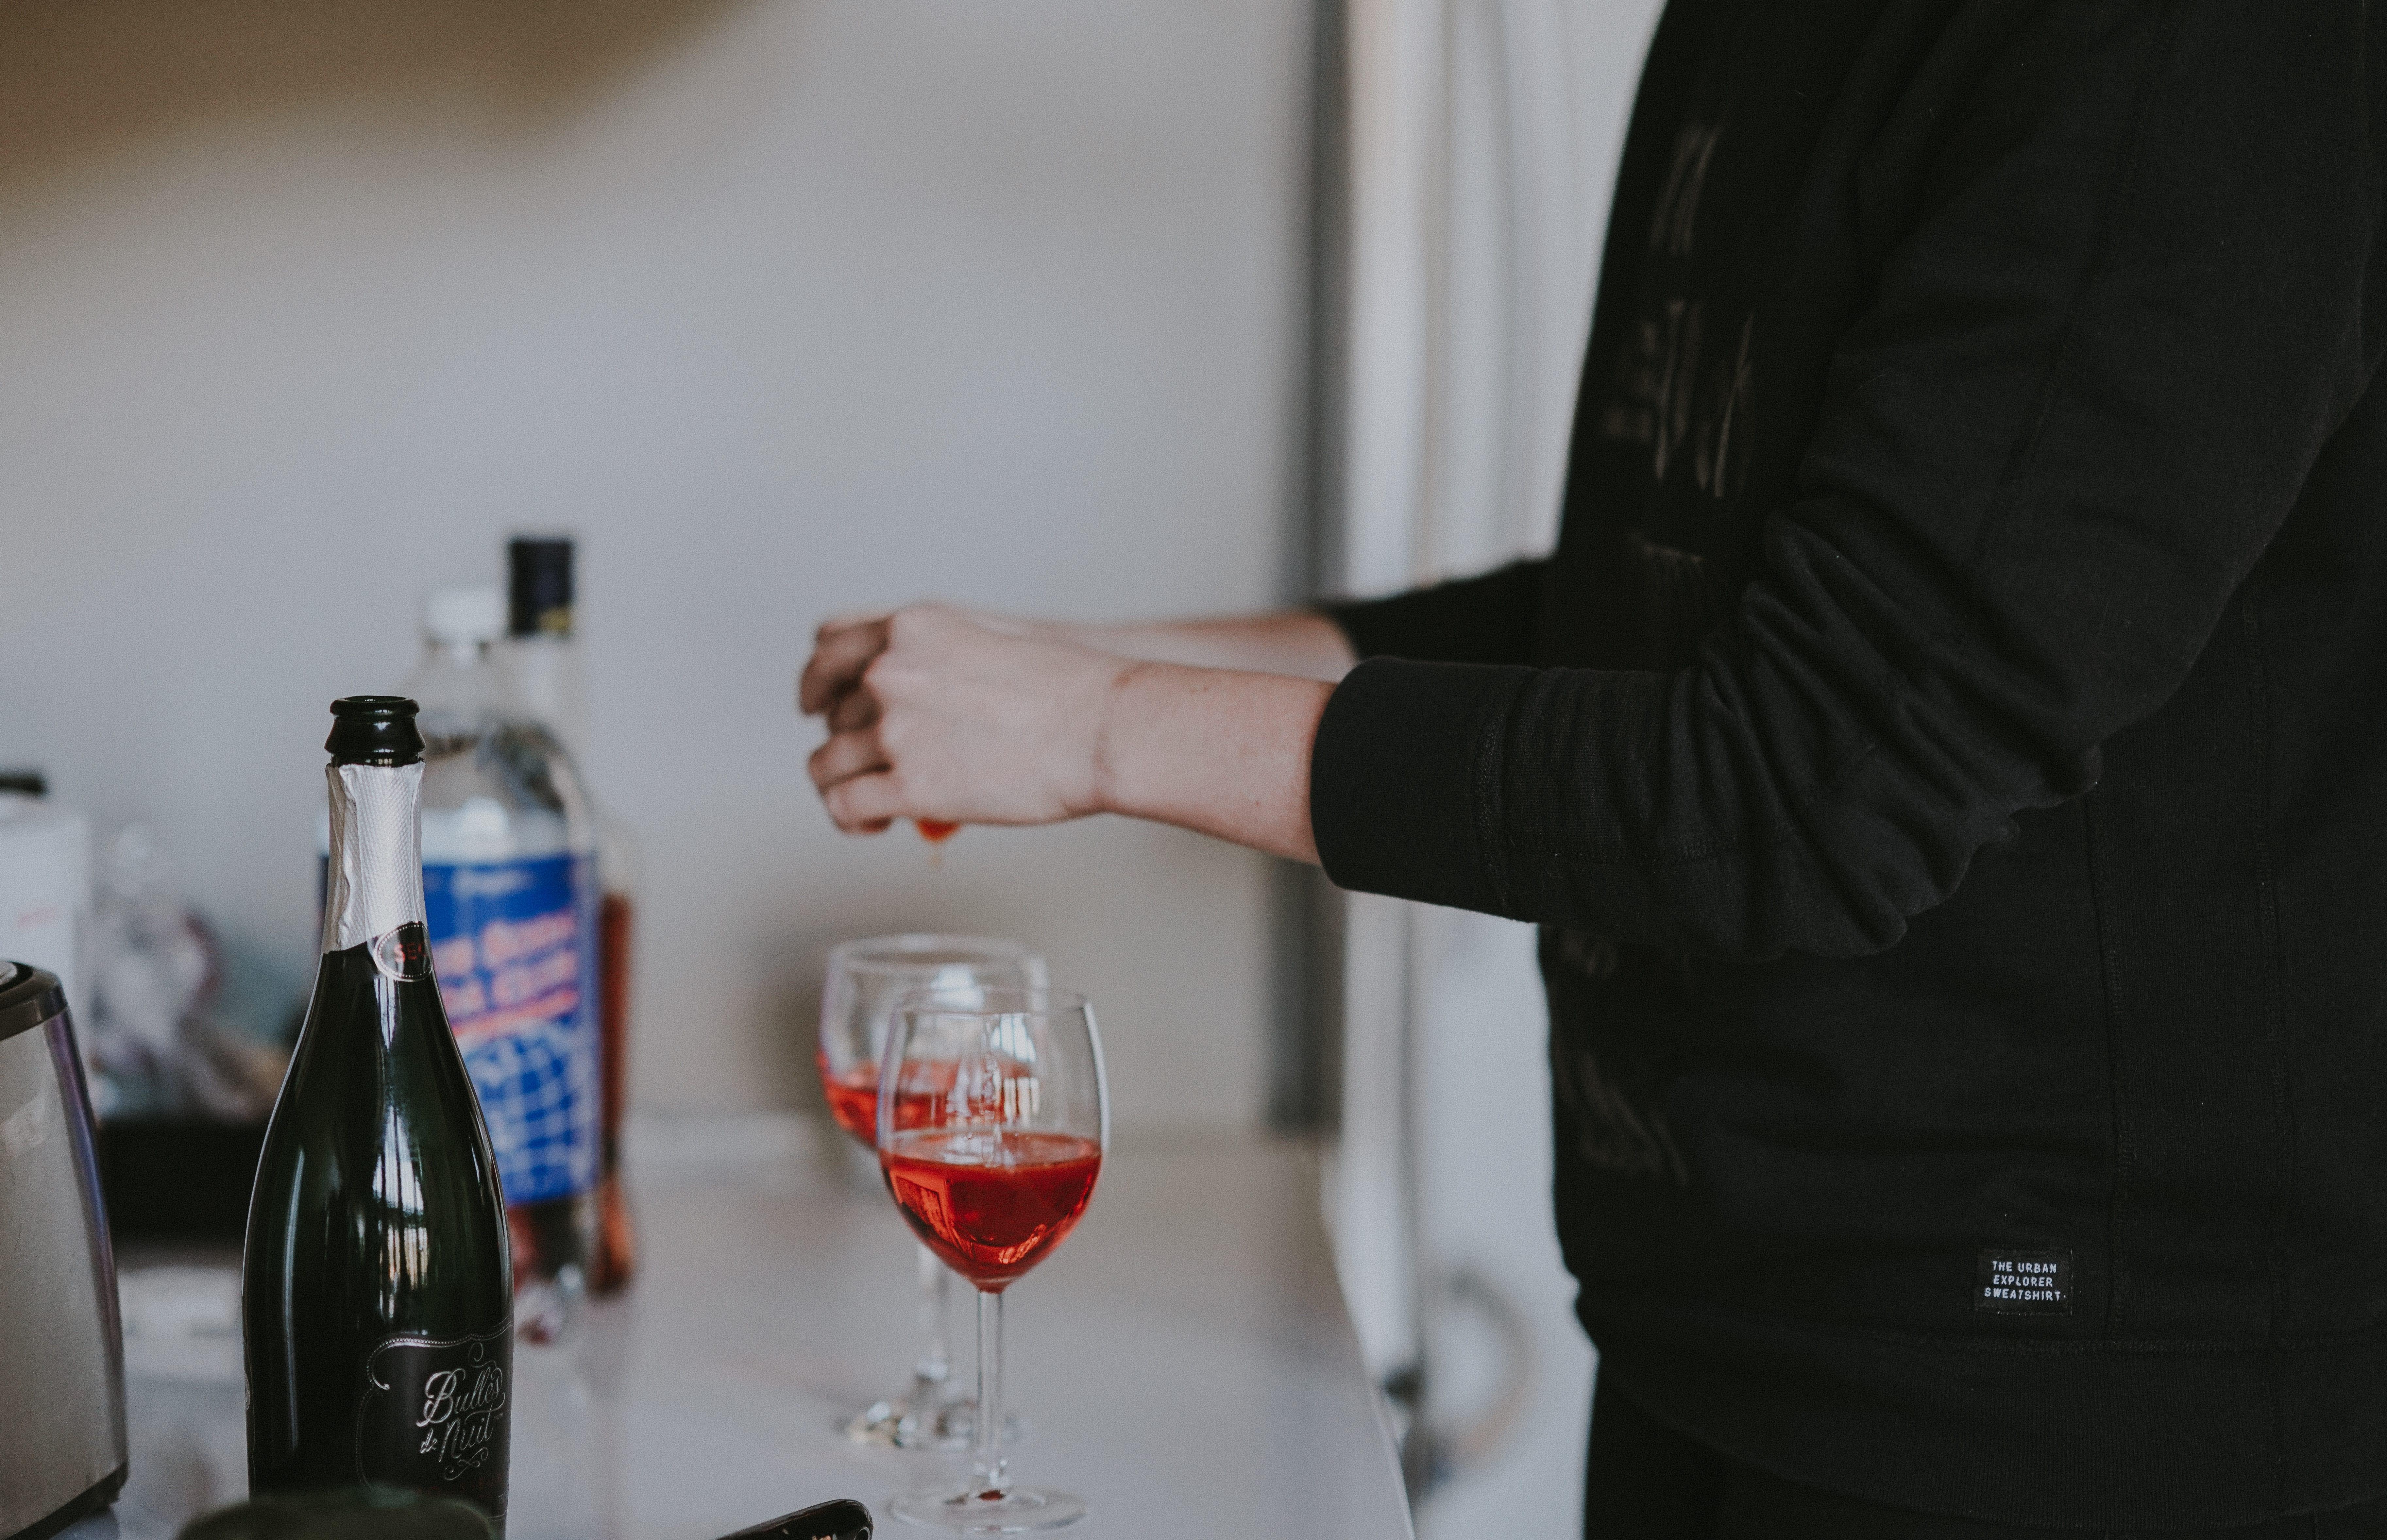 Woman making a cocktail; image by Annie Spratt, via Unsplash.com.